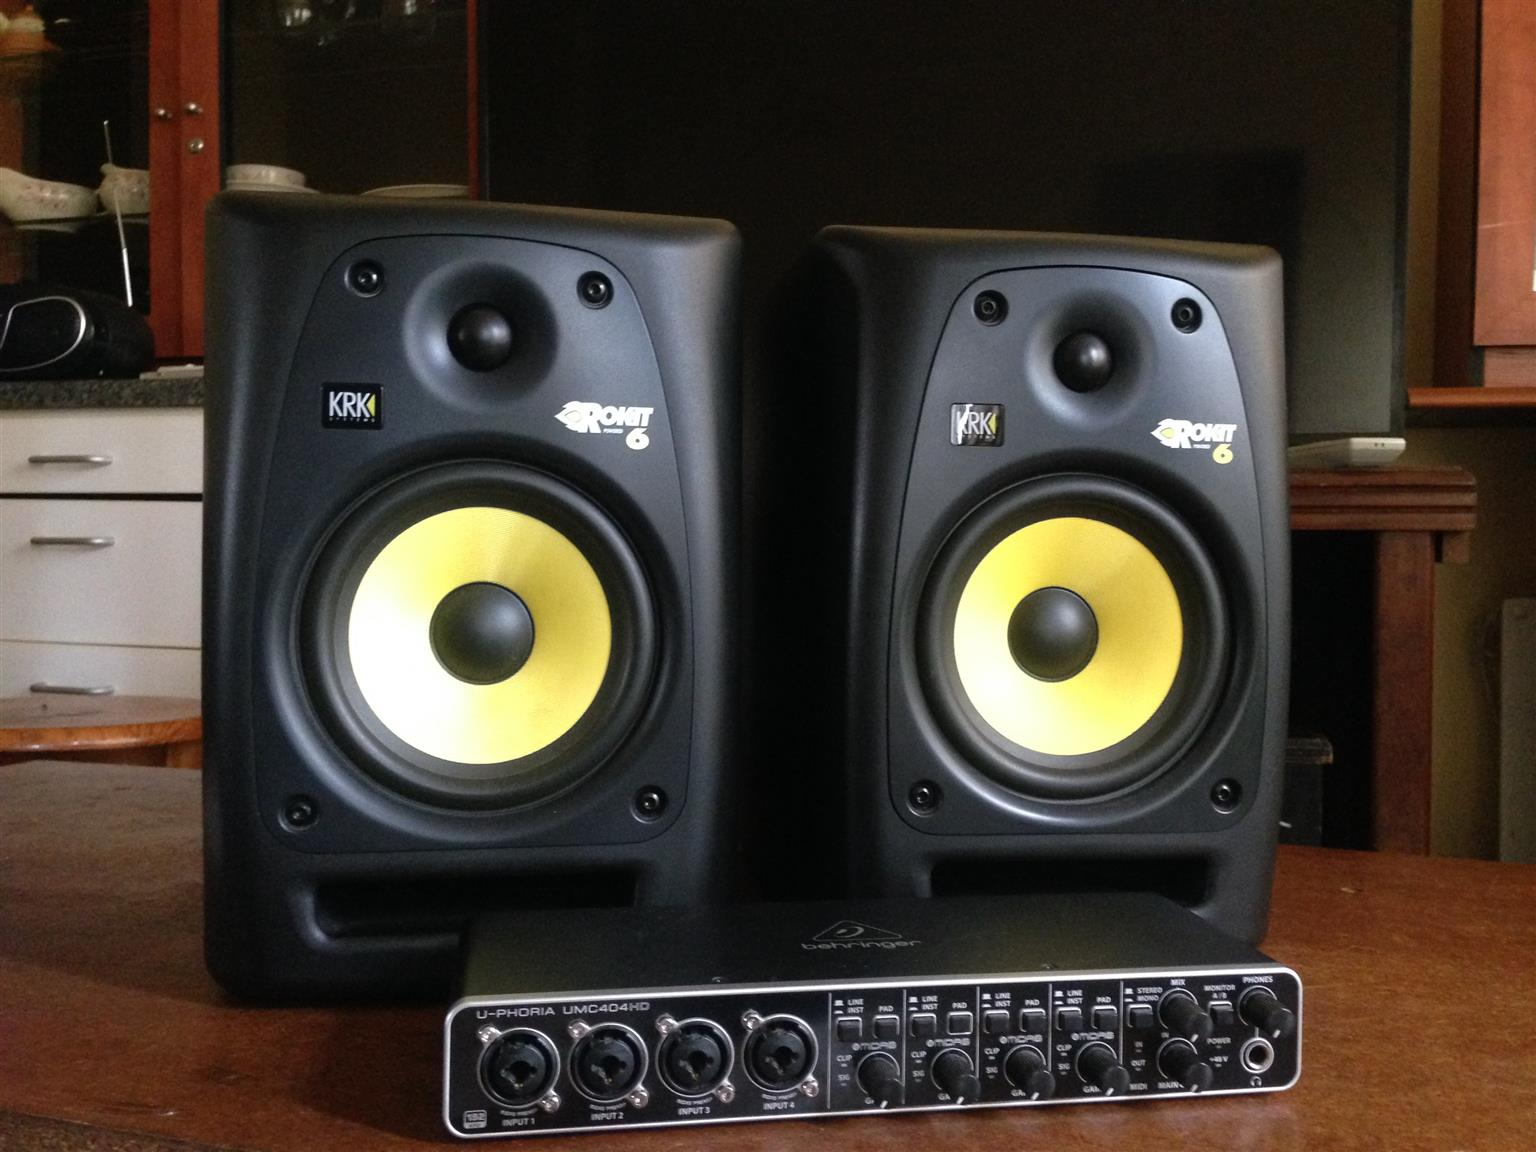 KRK 6 & 4x4 Behringer USB Audio Interface